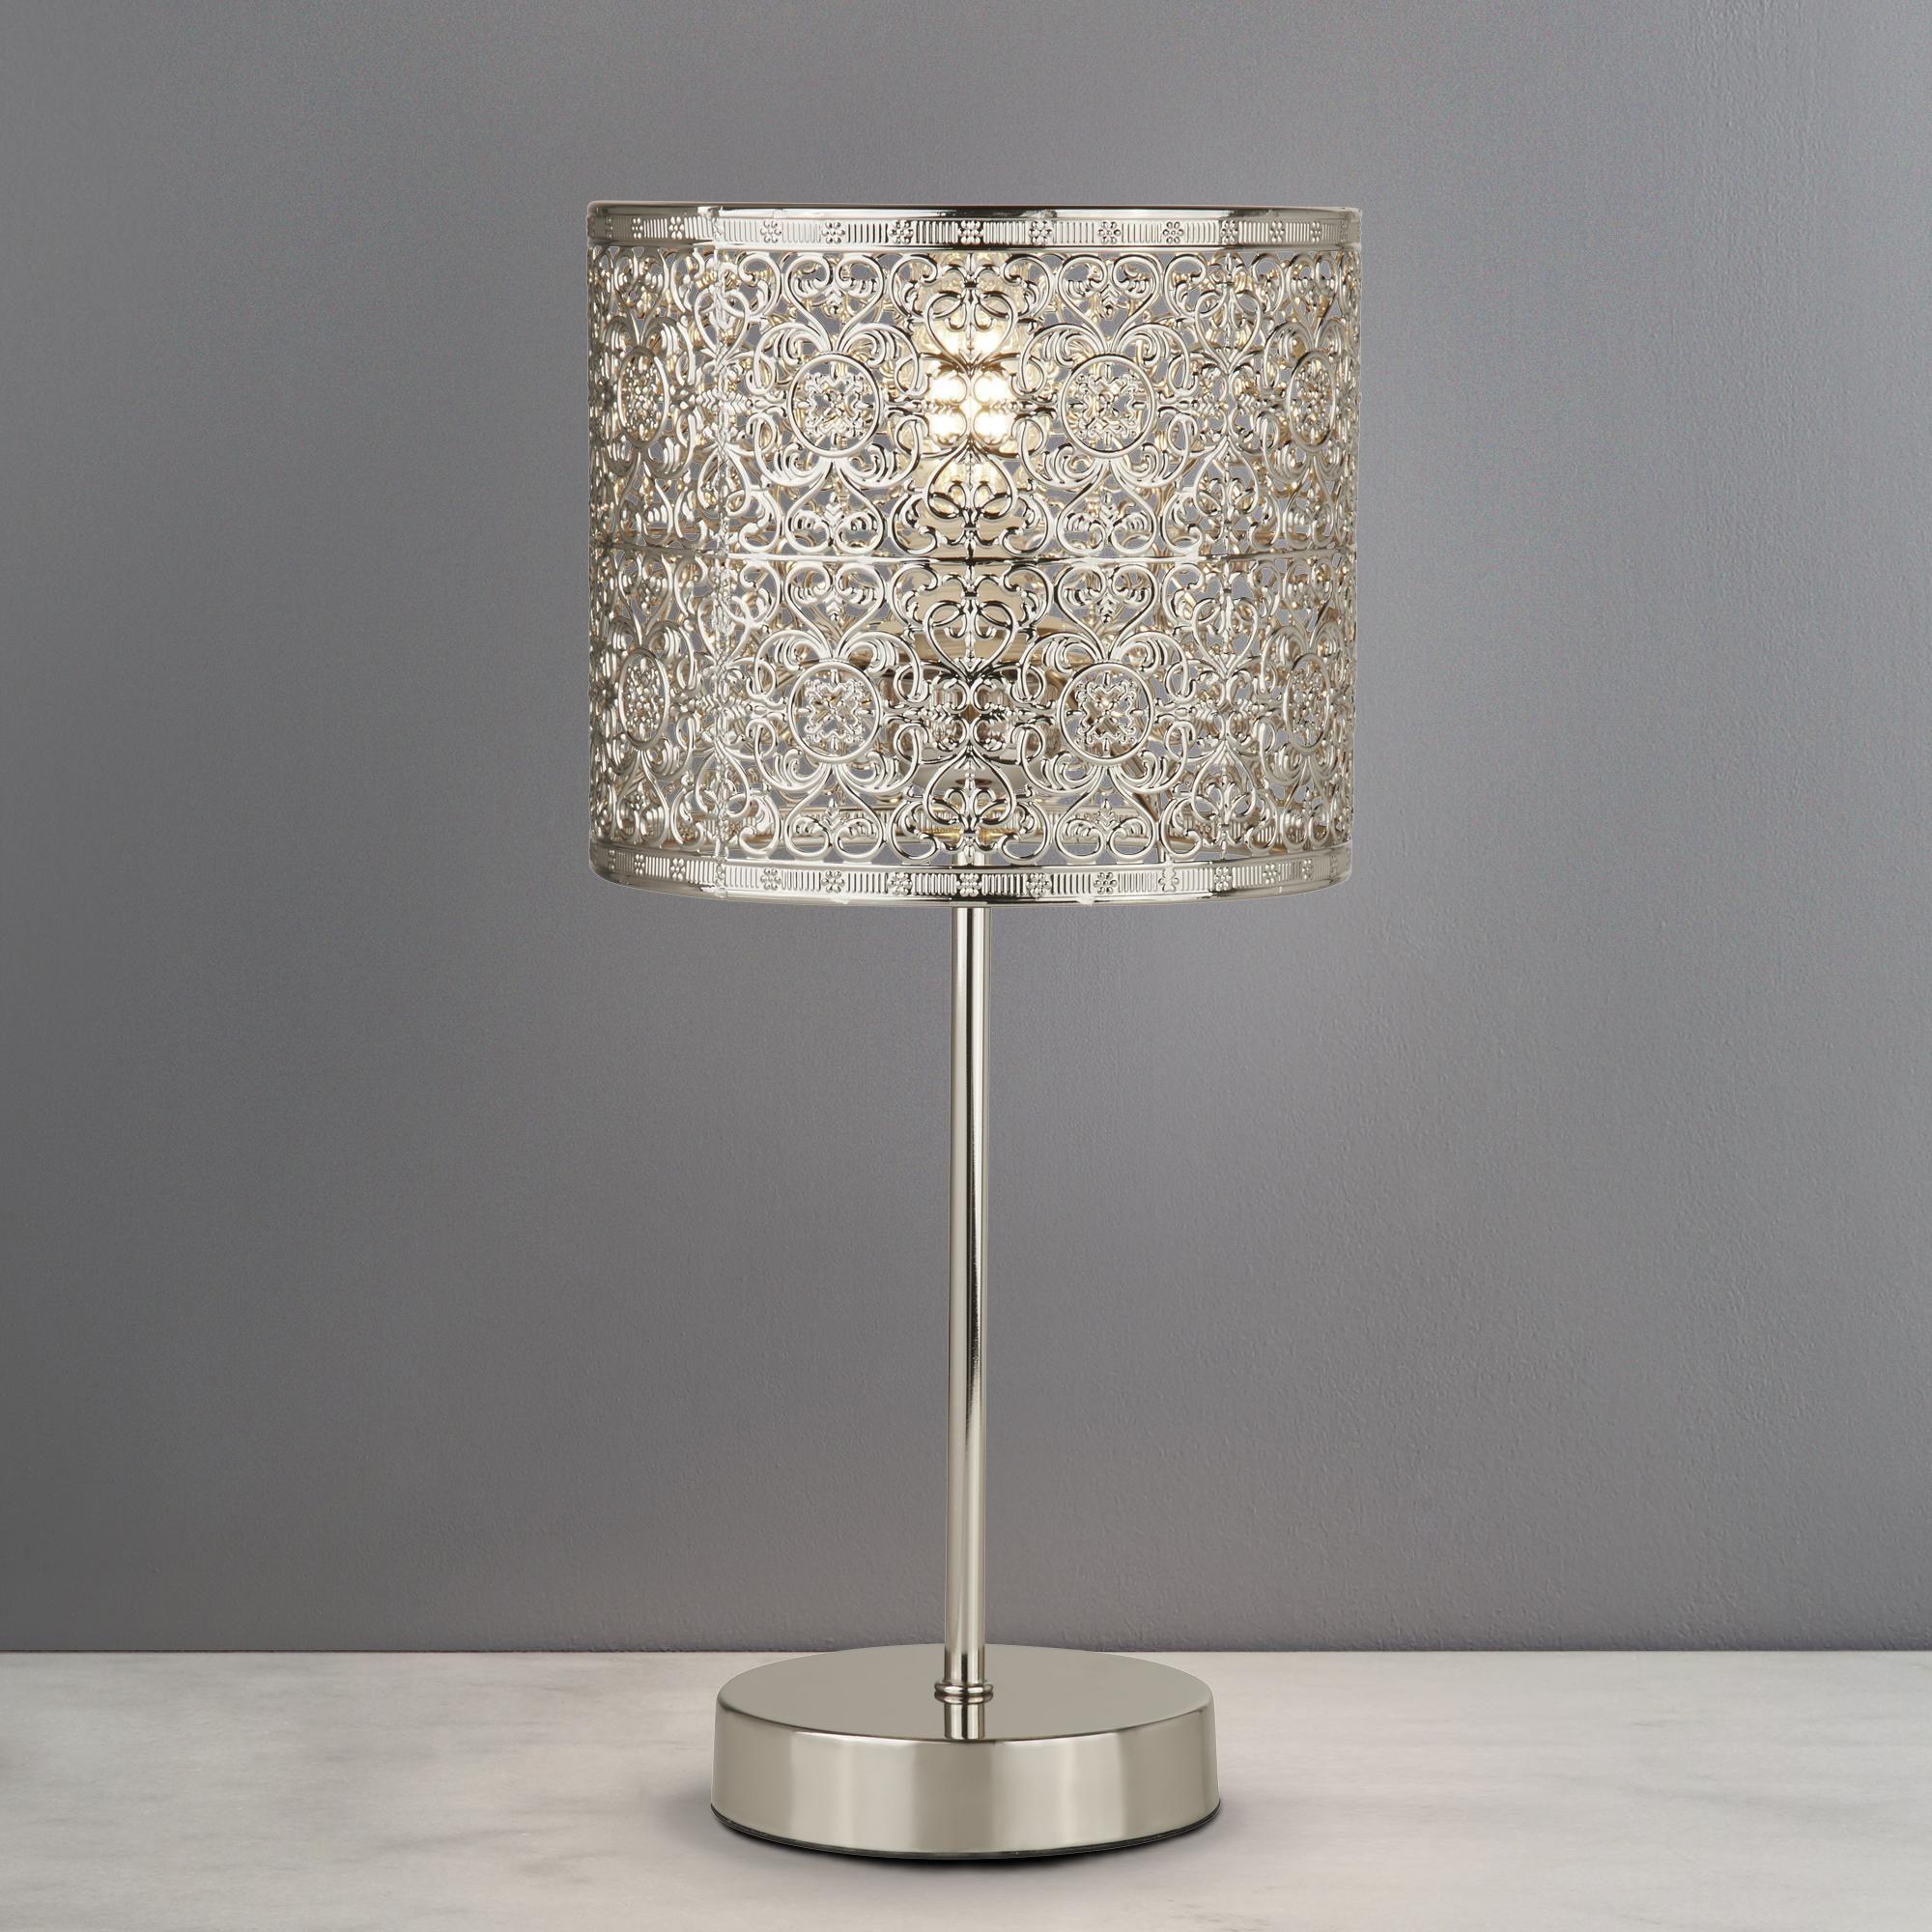 Dunelm Vintage Silver Tunis Fretwork Table Lamp Silver Table Lamps Table Lamp Bedside Table Lamps